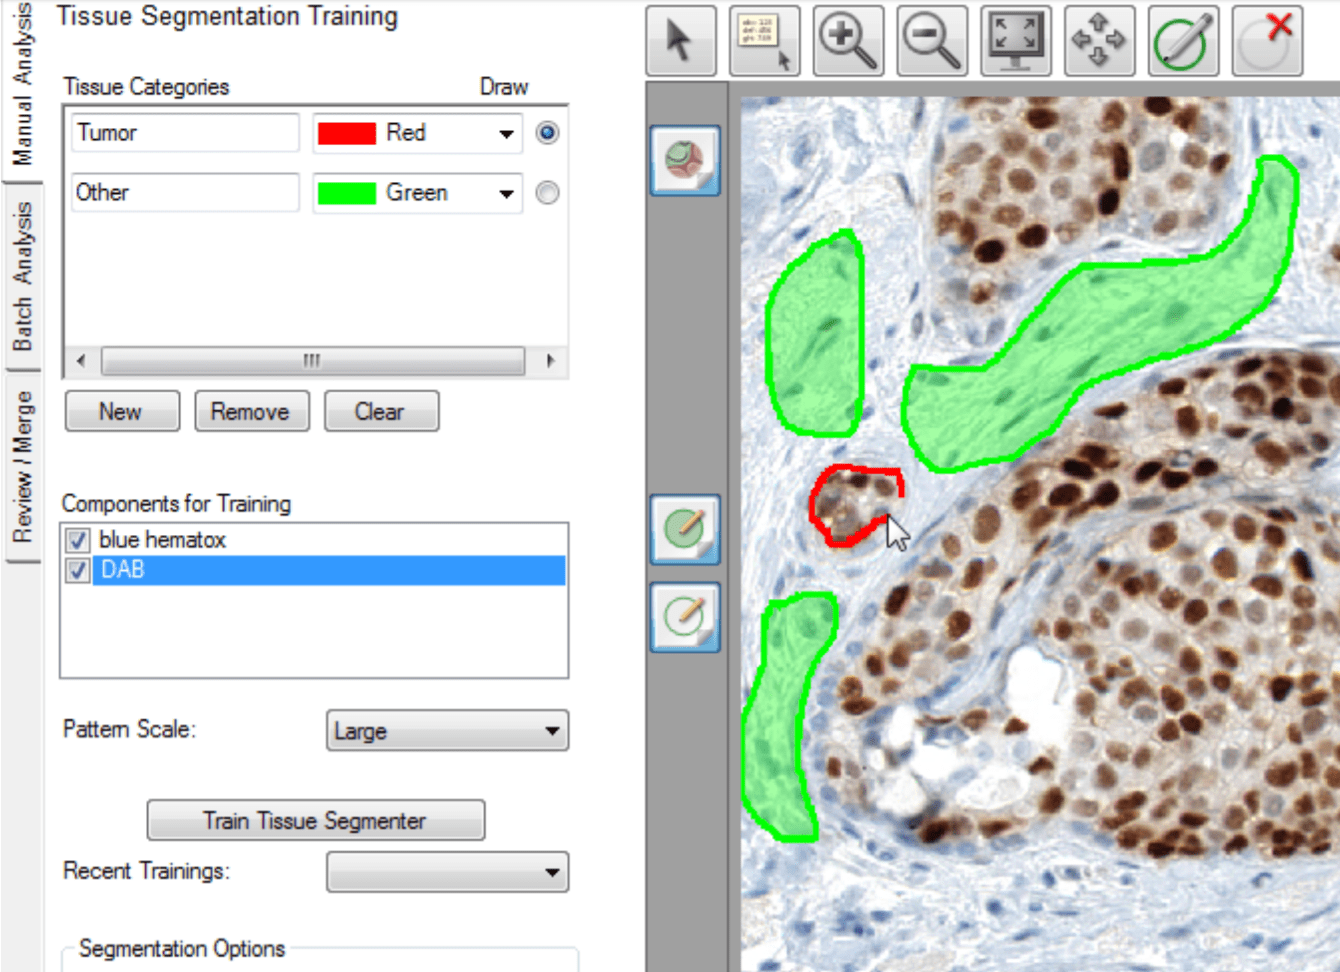 Tissue segmentation training in inForm